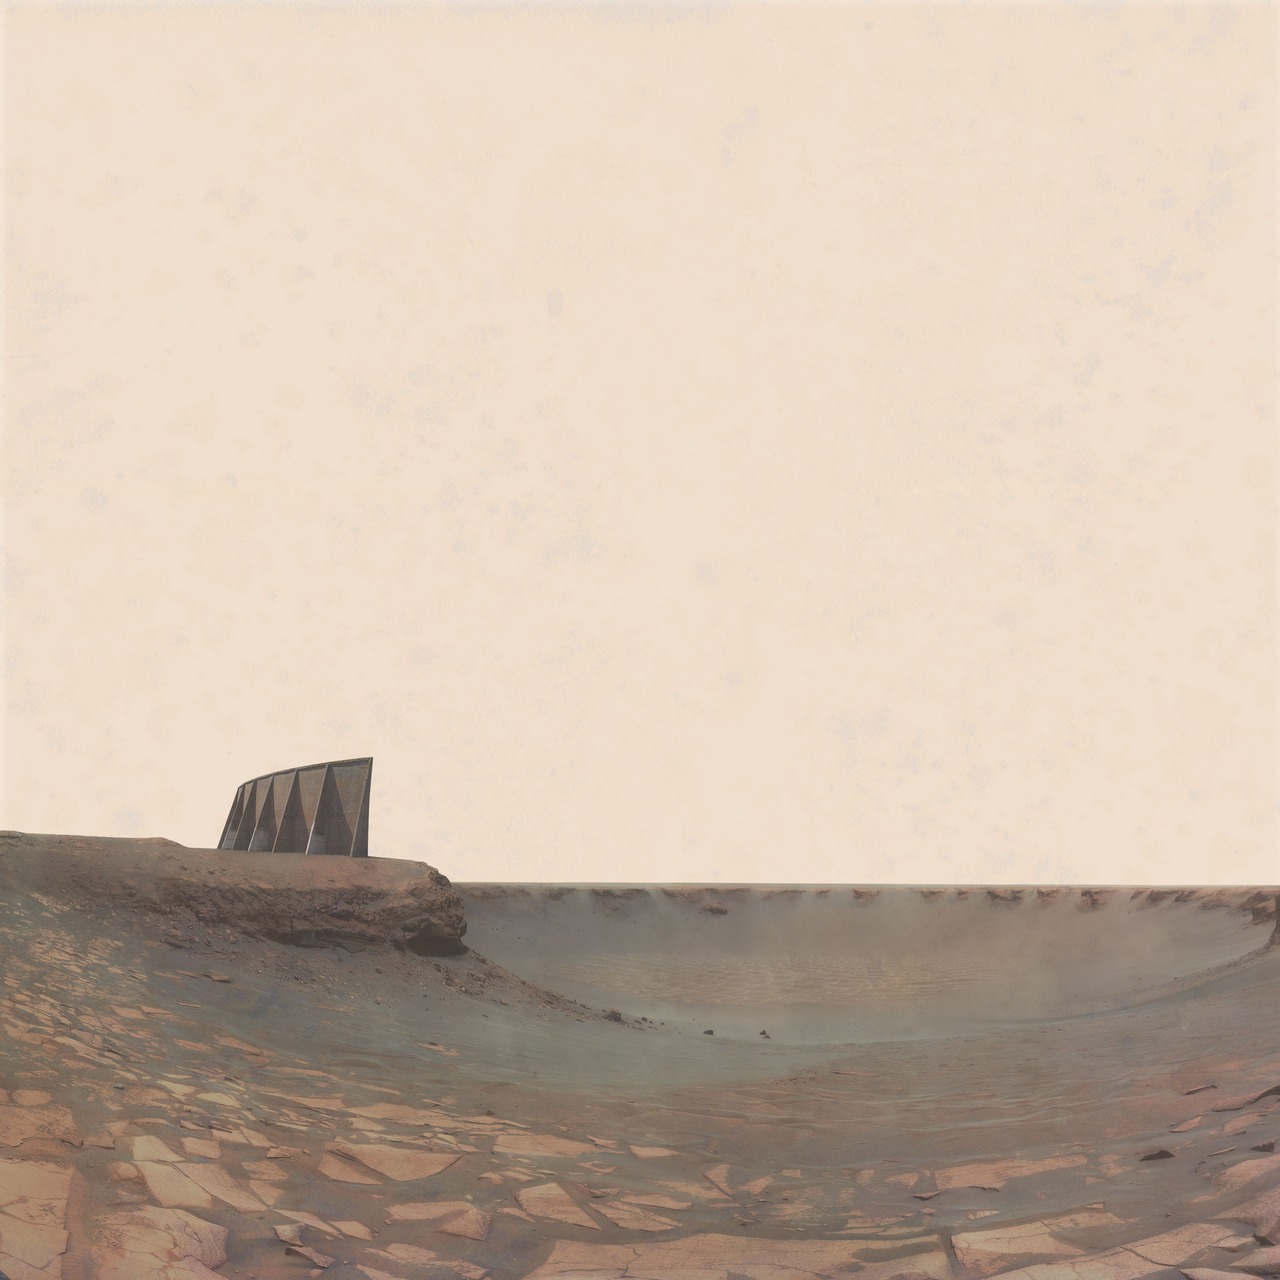 Kahn / Selesnick - concrete ear 3